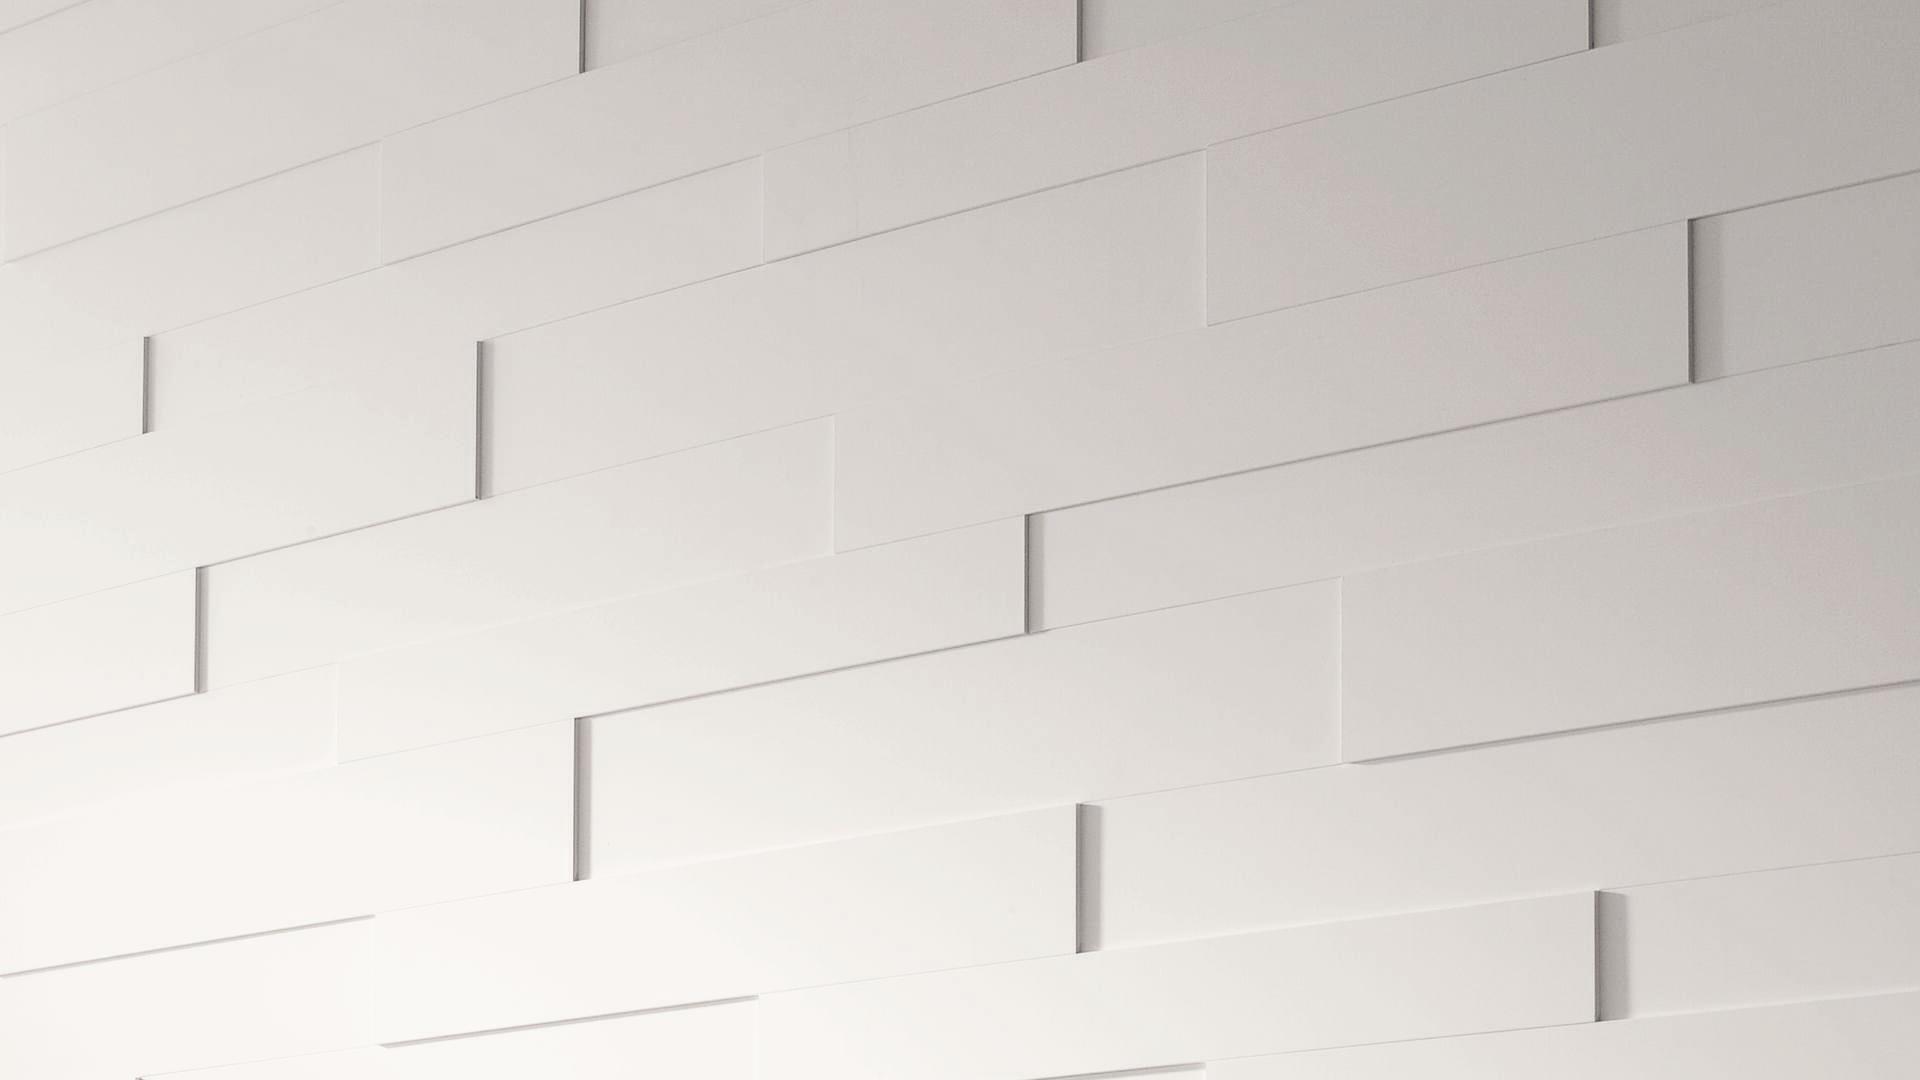 Systempaneele Nova SP 300 Weiß 4038